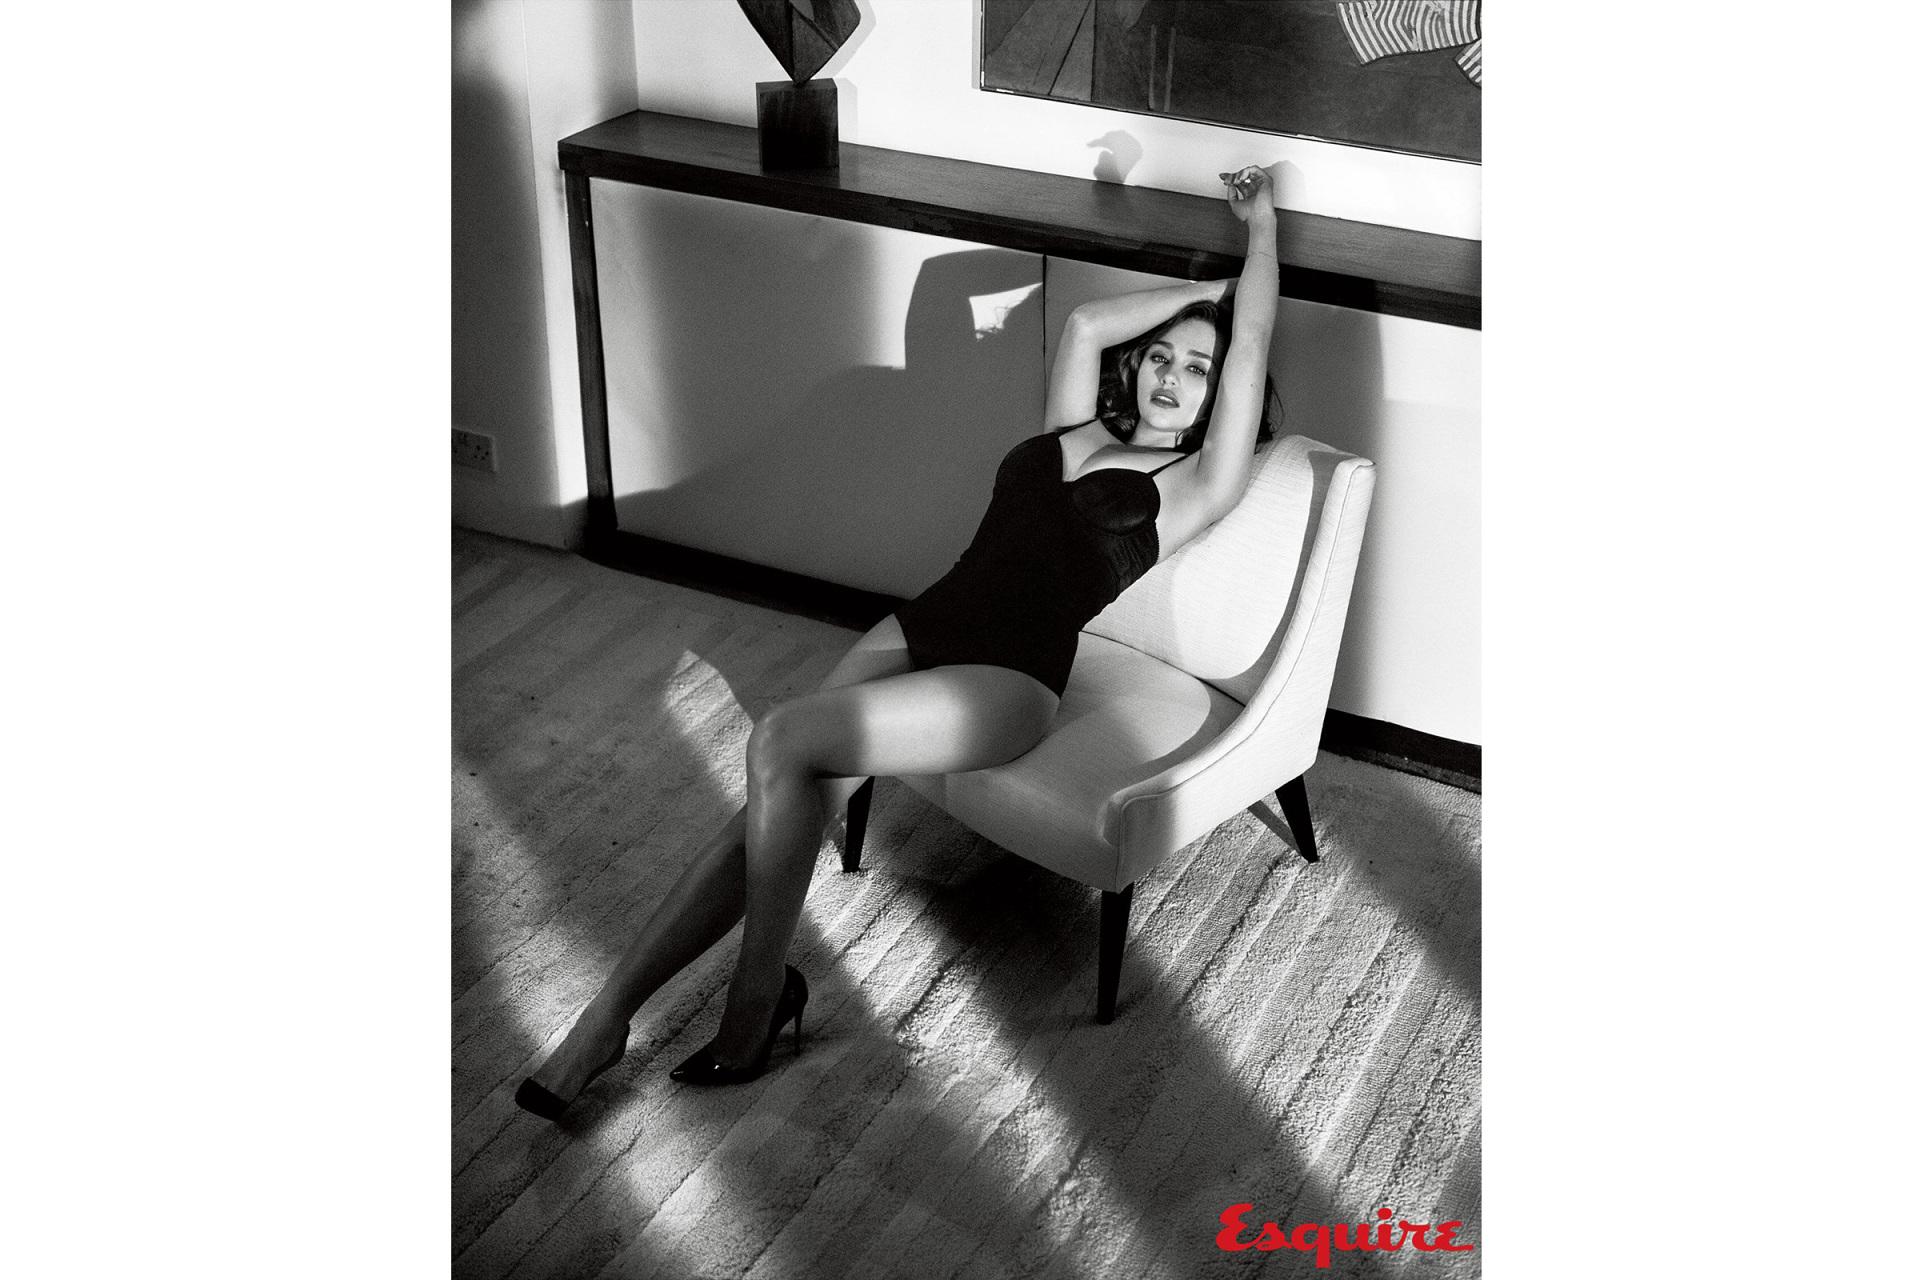 The Sexiest Woman Alive: Emilia Clarke 5